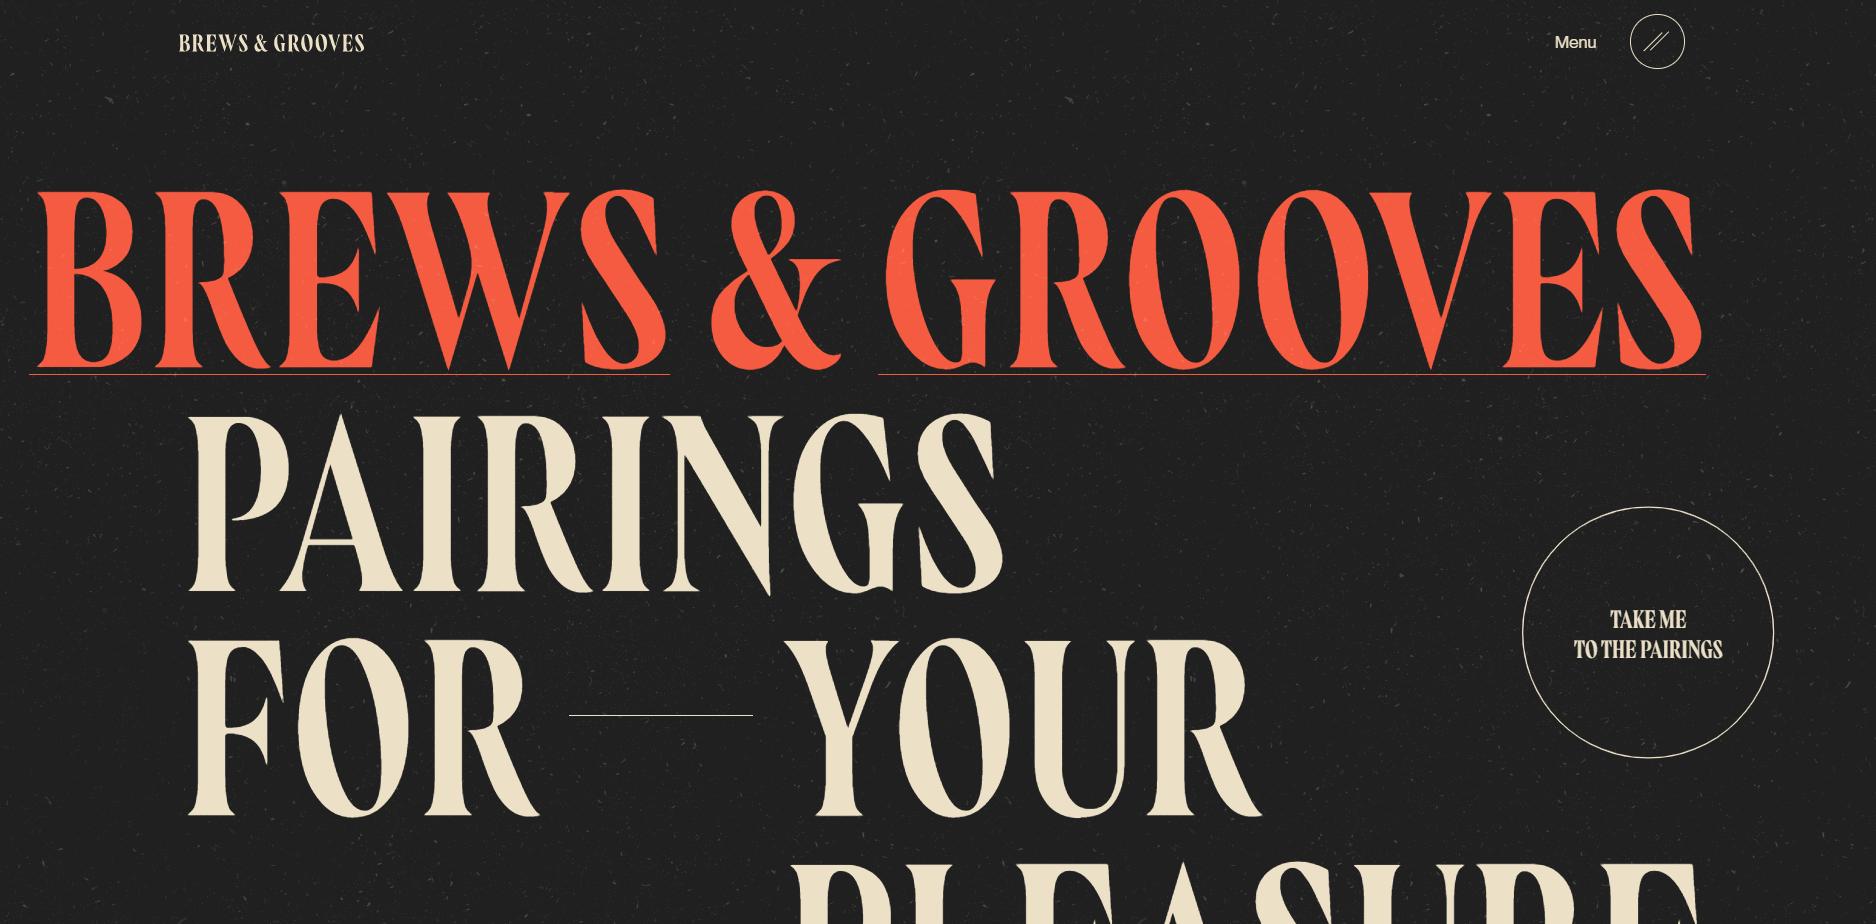 Best Agency Website for Brews & Grooves